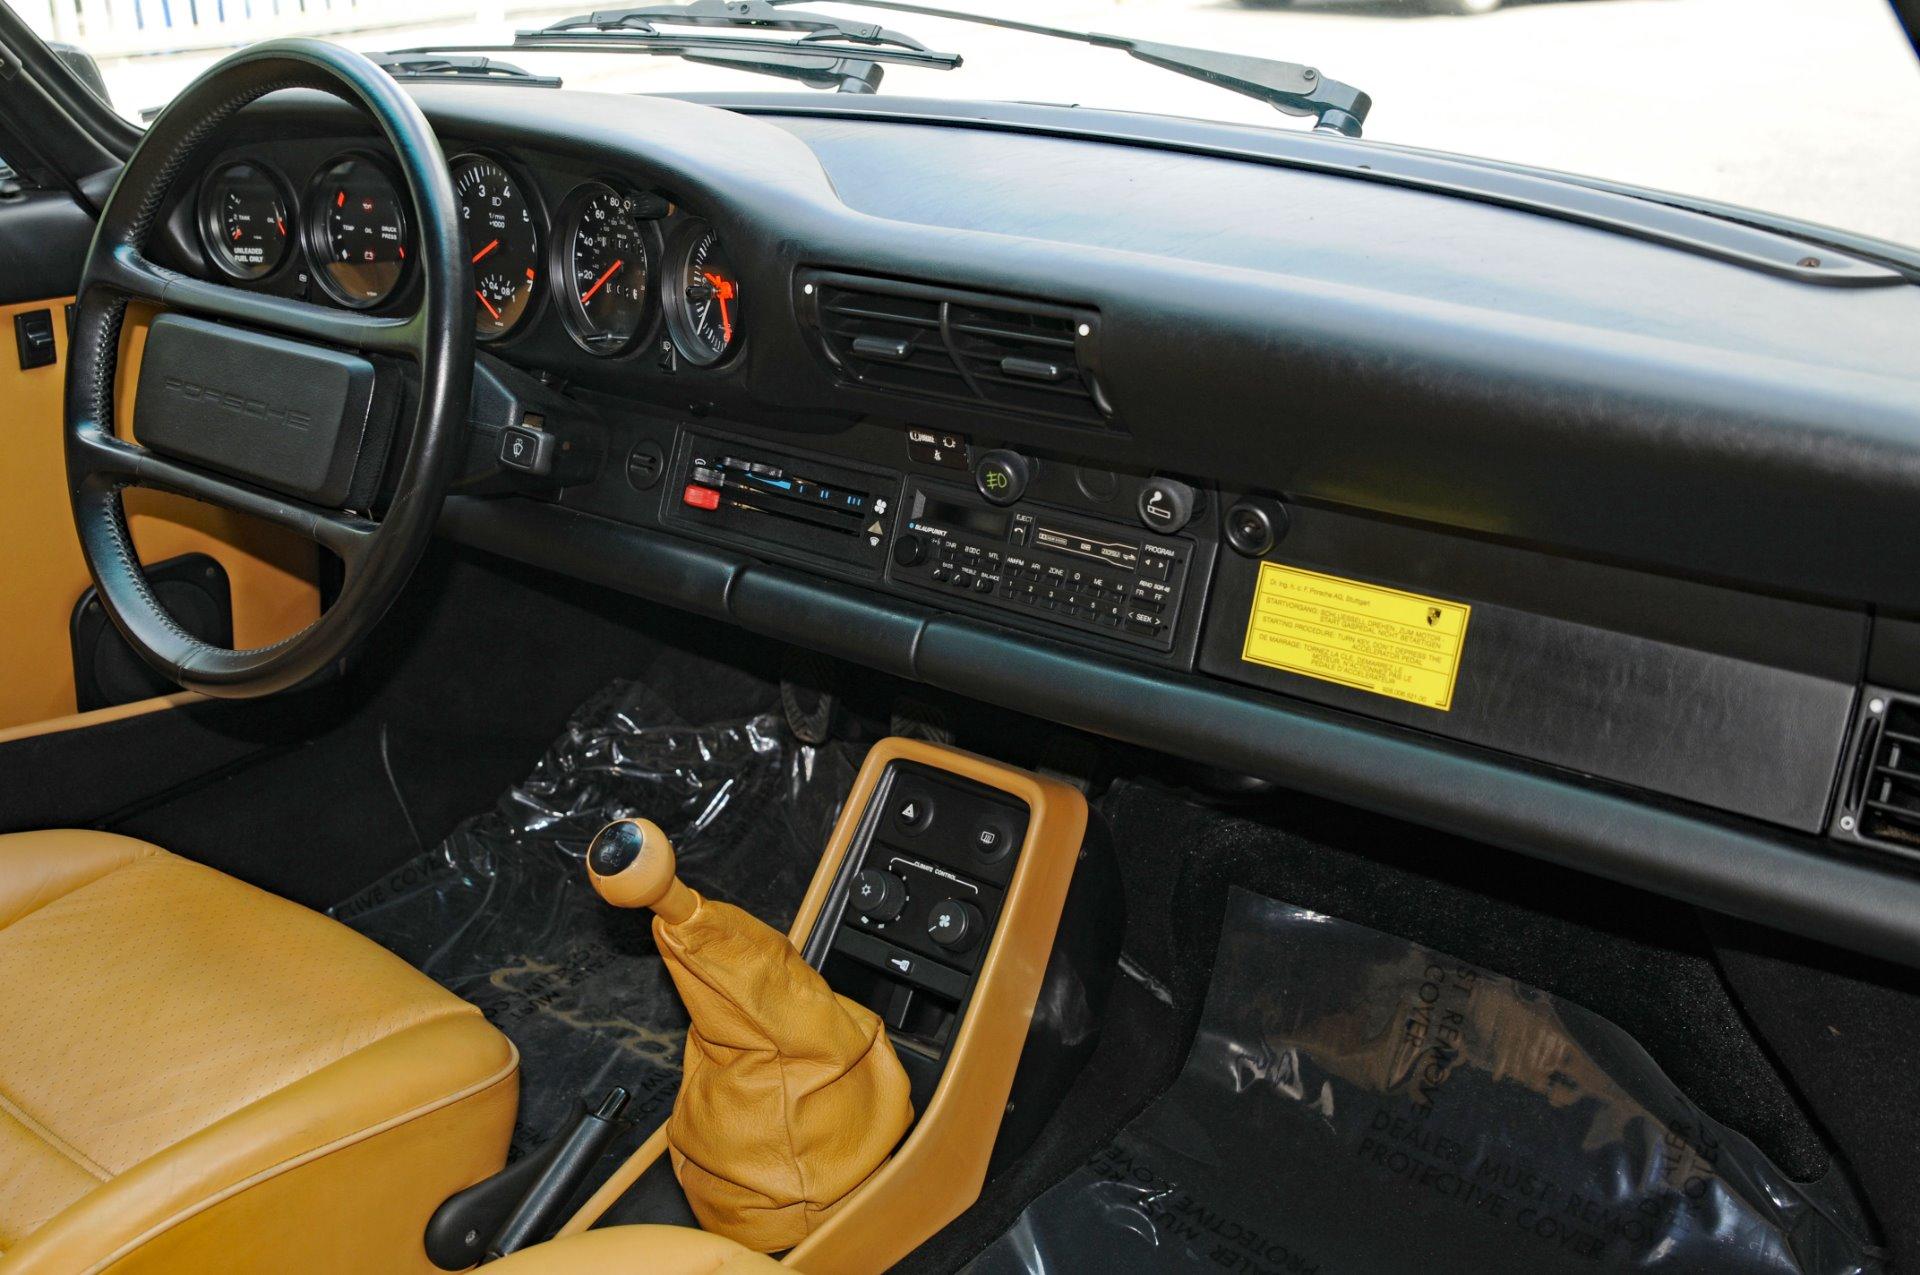 Used-1987-Porsche-911-Carrera-Turbo-Factory-Slantnose